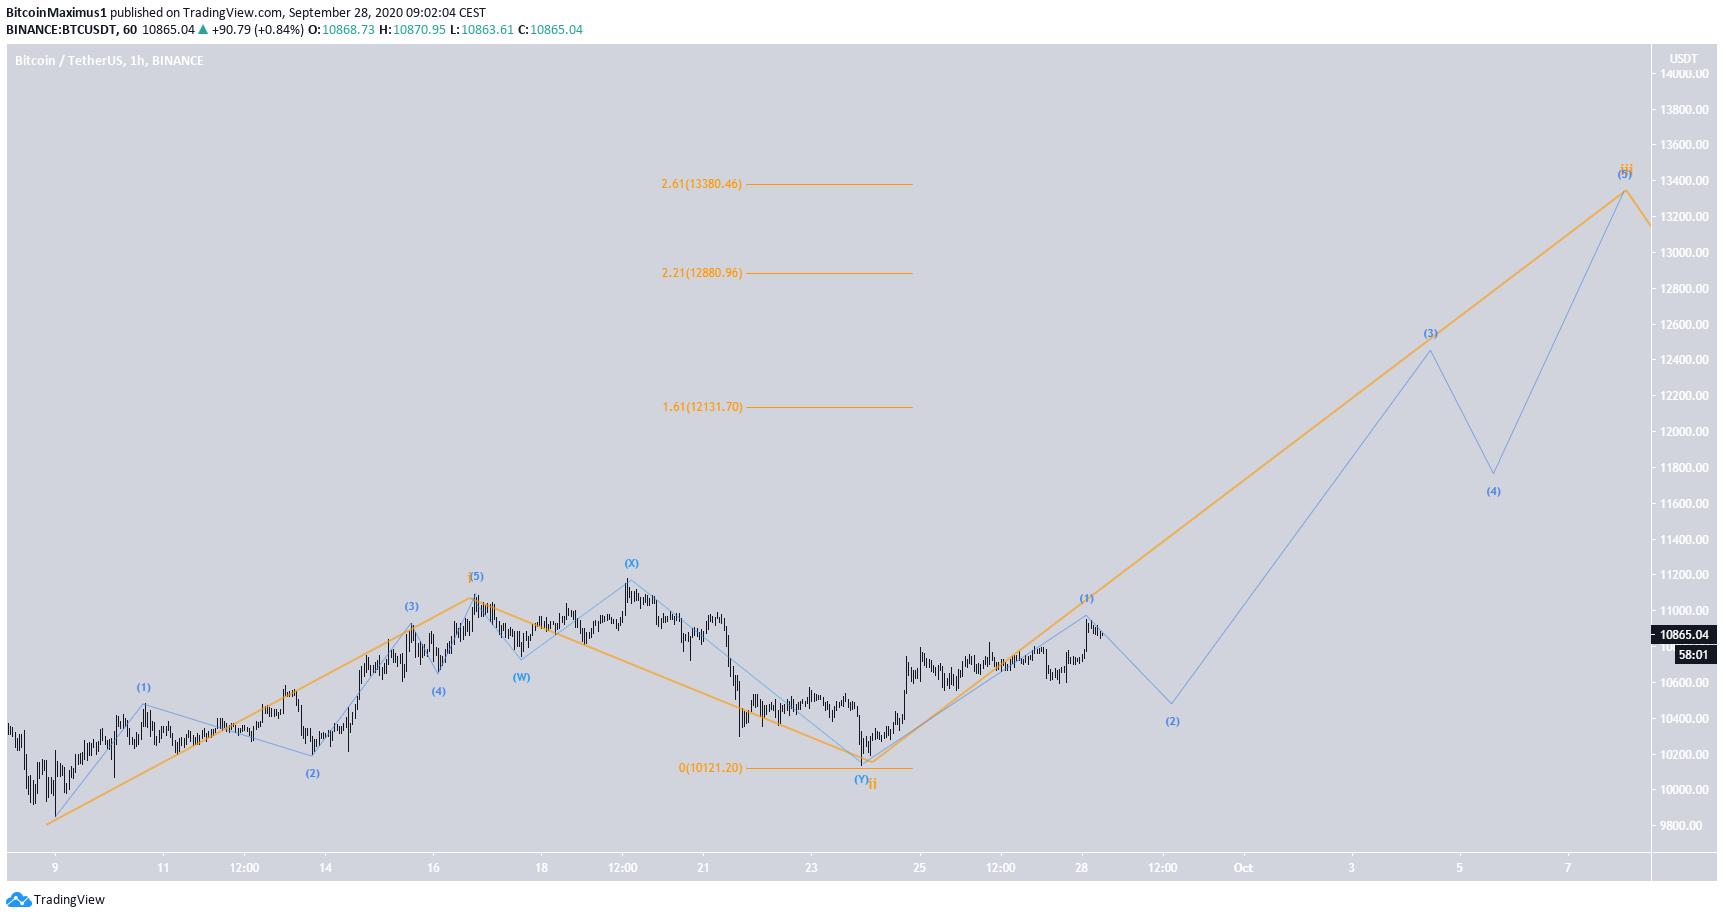 Bitcoin Short-Term Count